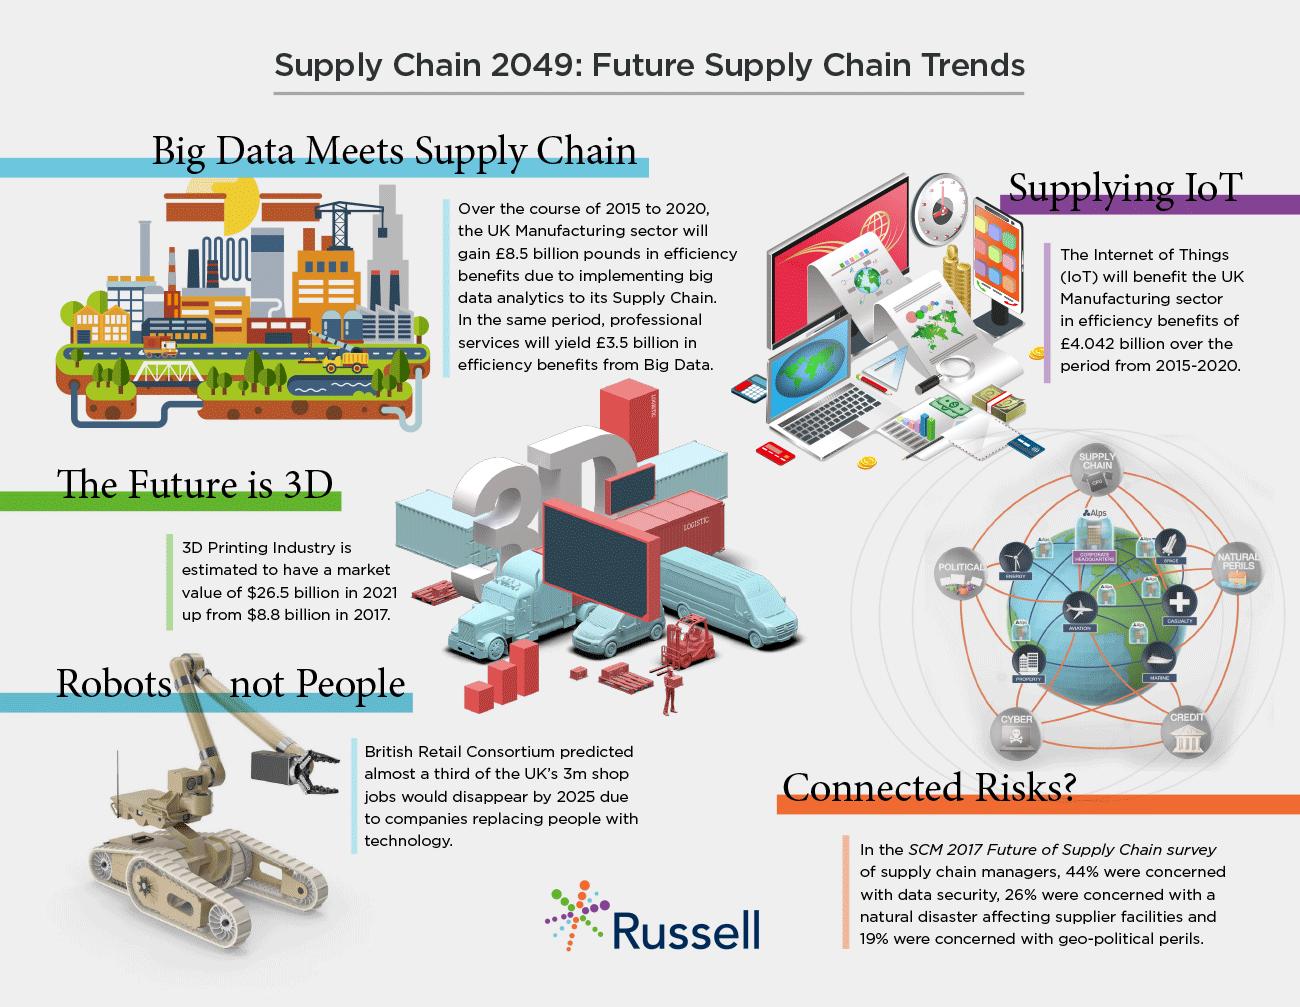 Supply Chain 2049: Future Supply Chain Trends